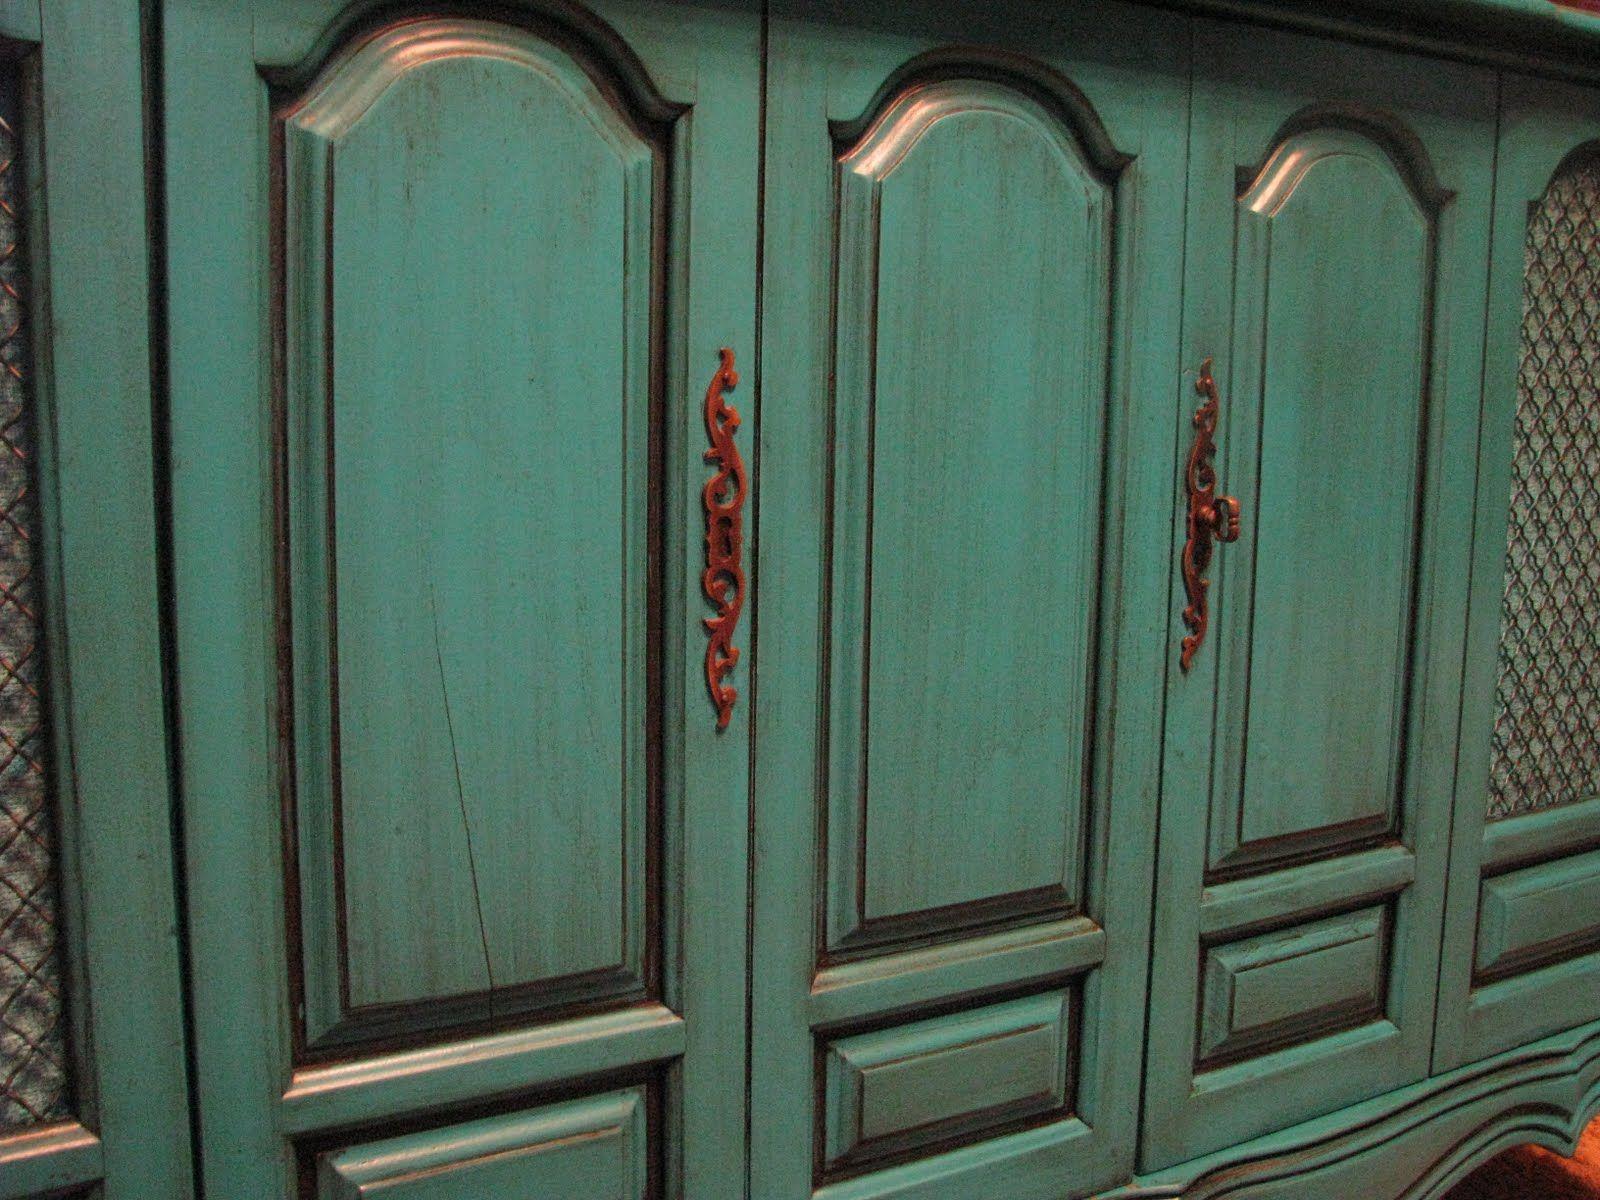 403 Forbidden Diy Kitchen Cabinets Makeover Teal Kitchen Cabinets Cabinet